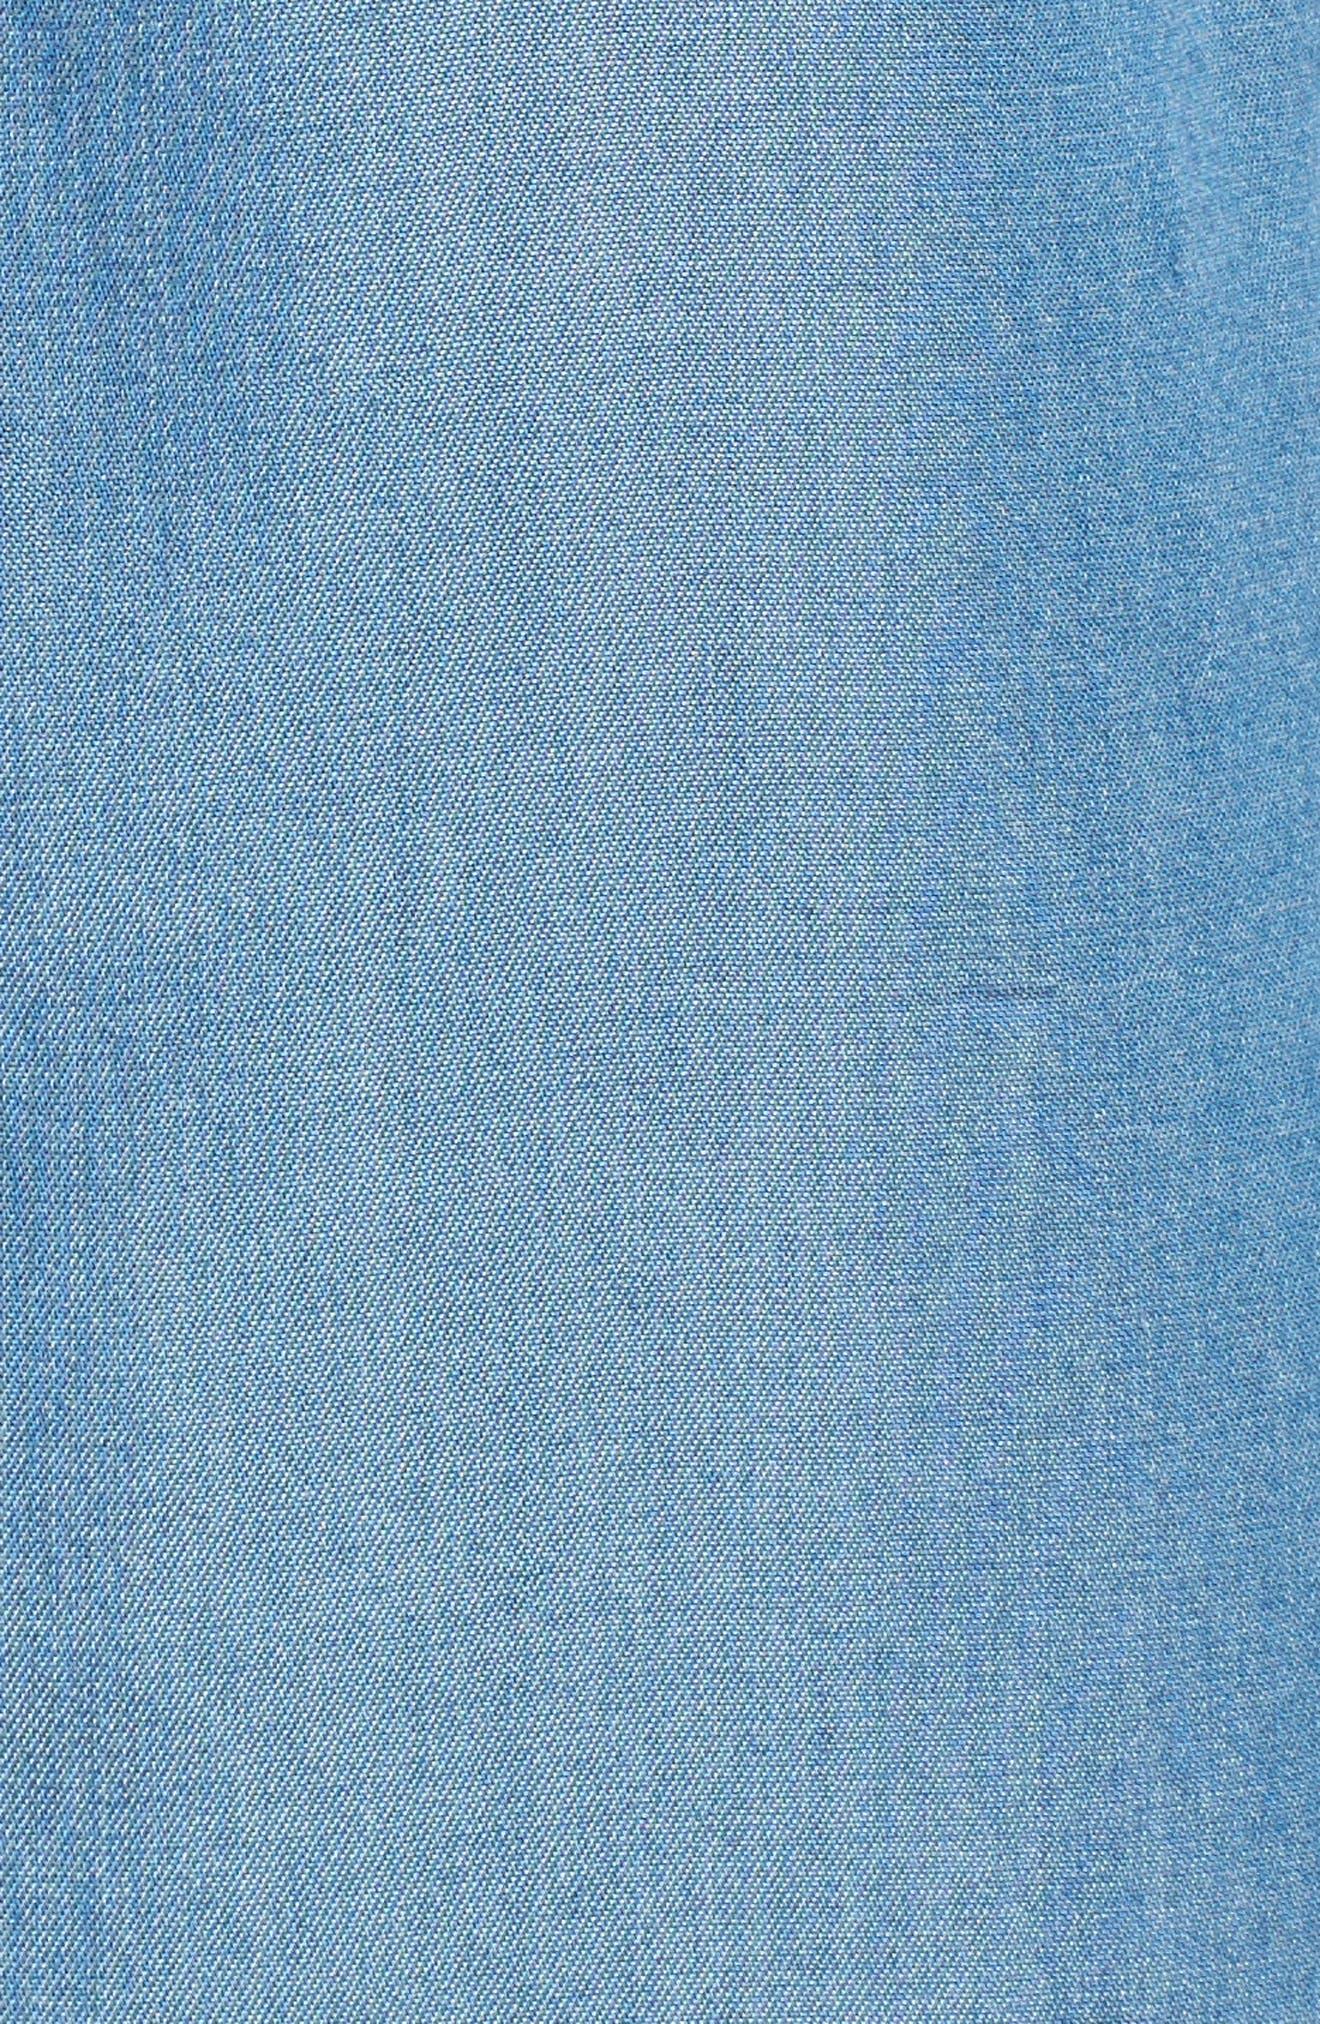 MICHAEL MICHAEL KORS, Patch Pocket Chambray Shirtdress, Alternate thumbnail 5, color, 401